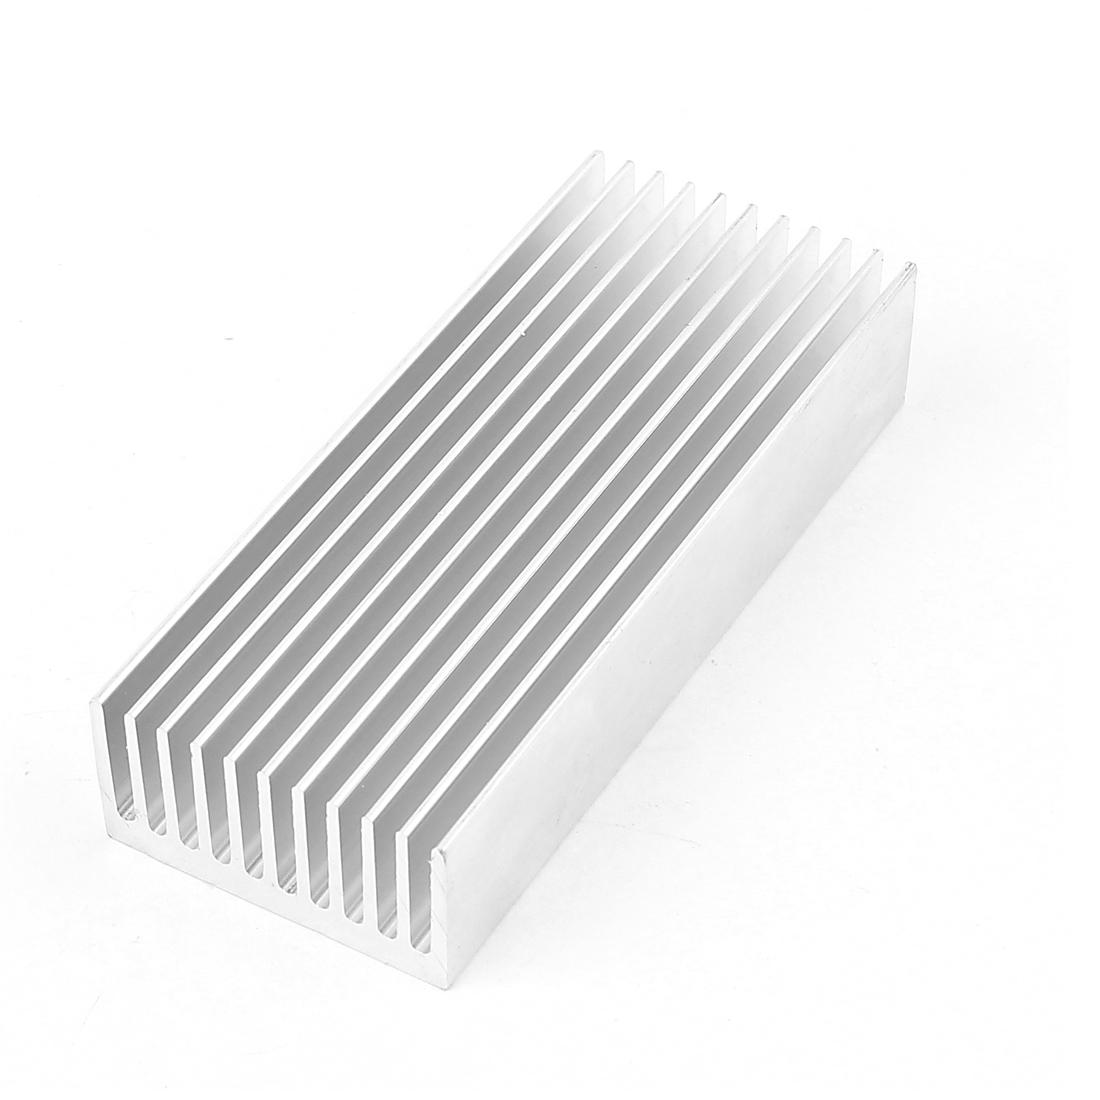 Aluminum Cooler Radiator Heat Sink Heatsink 98mmx40mmx20mm